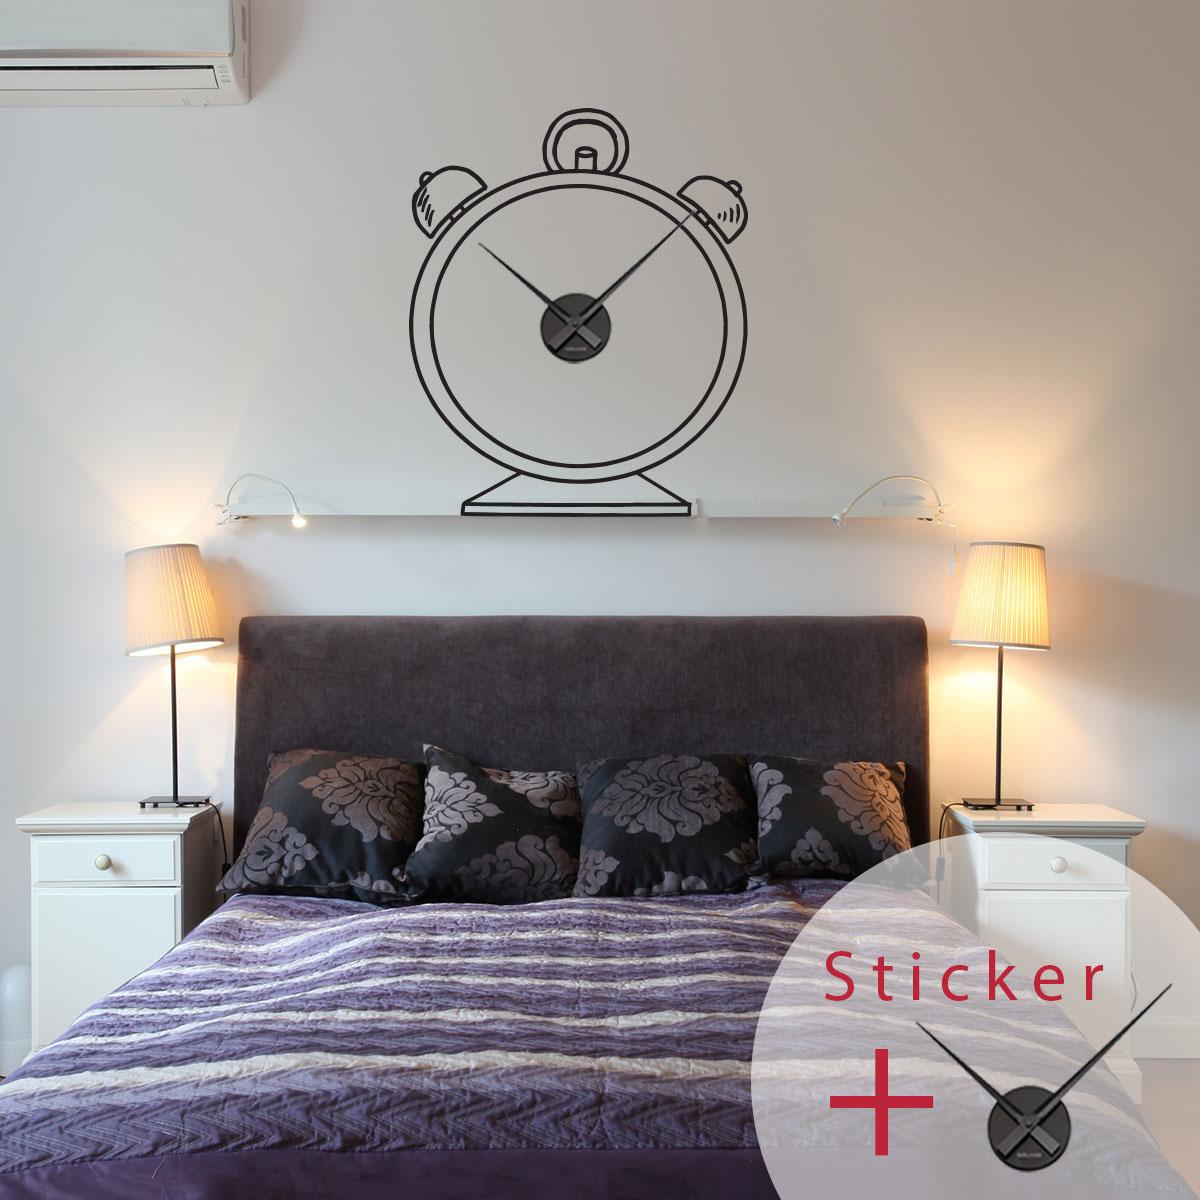 stickers muraux horloge geante good sticker horloge rveil with stickers muraux horloge geante. Black Bedroom Furniture Sets. Home Design Ideas